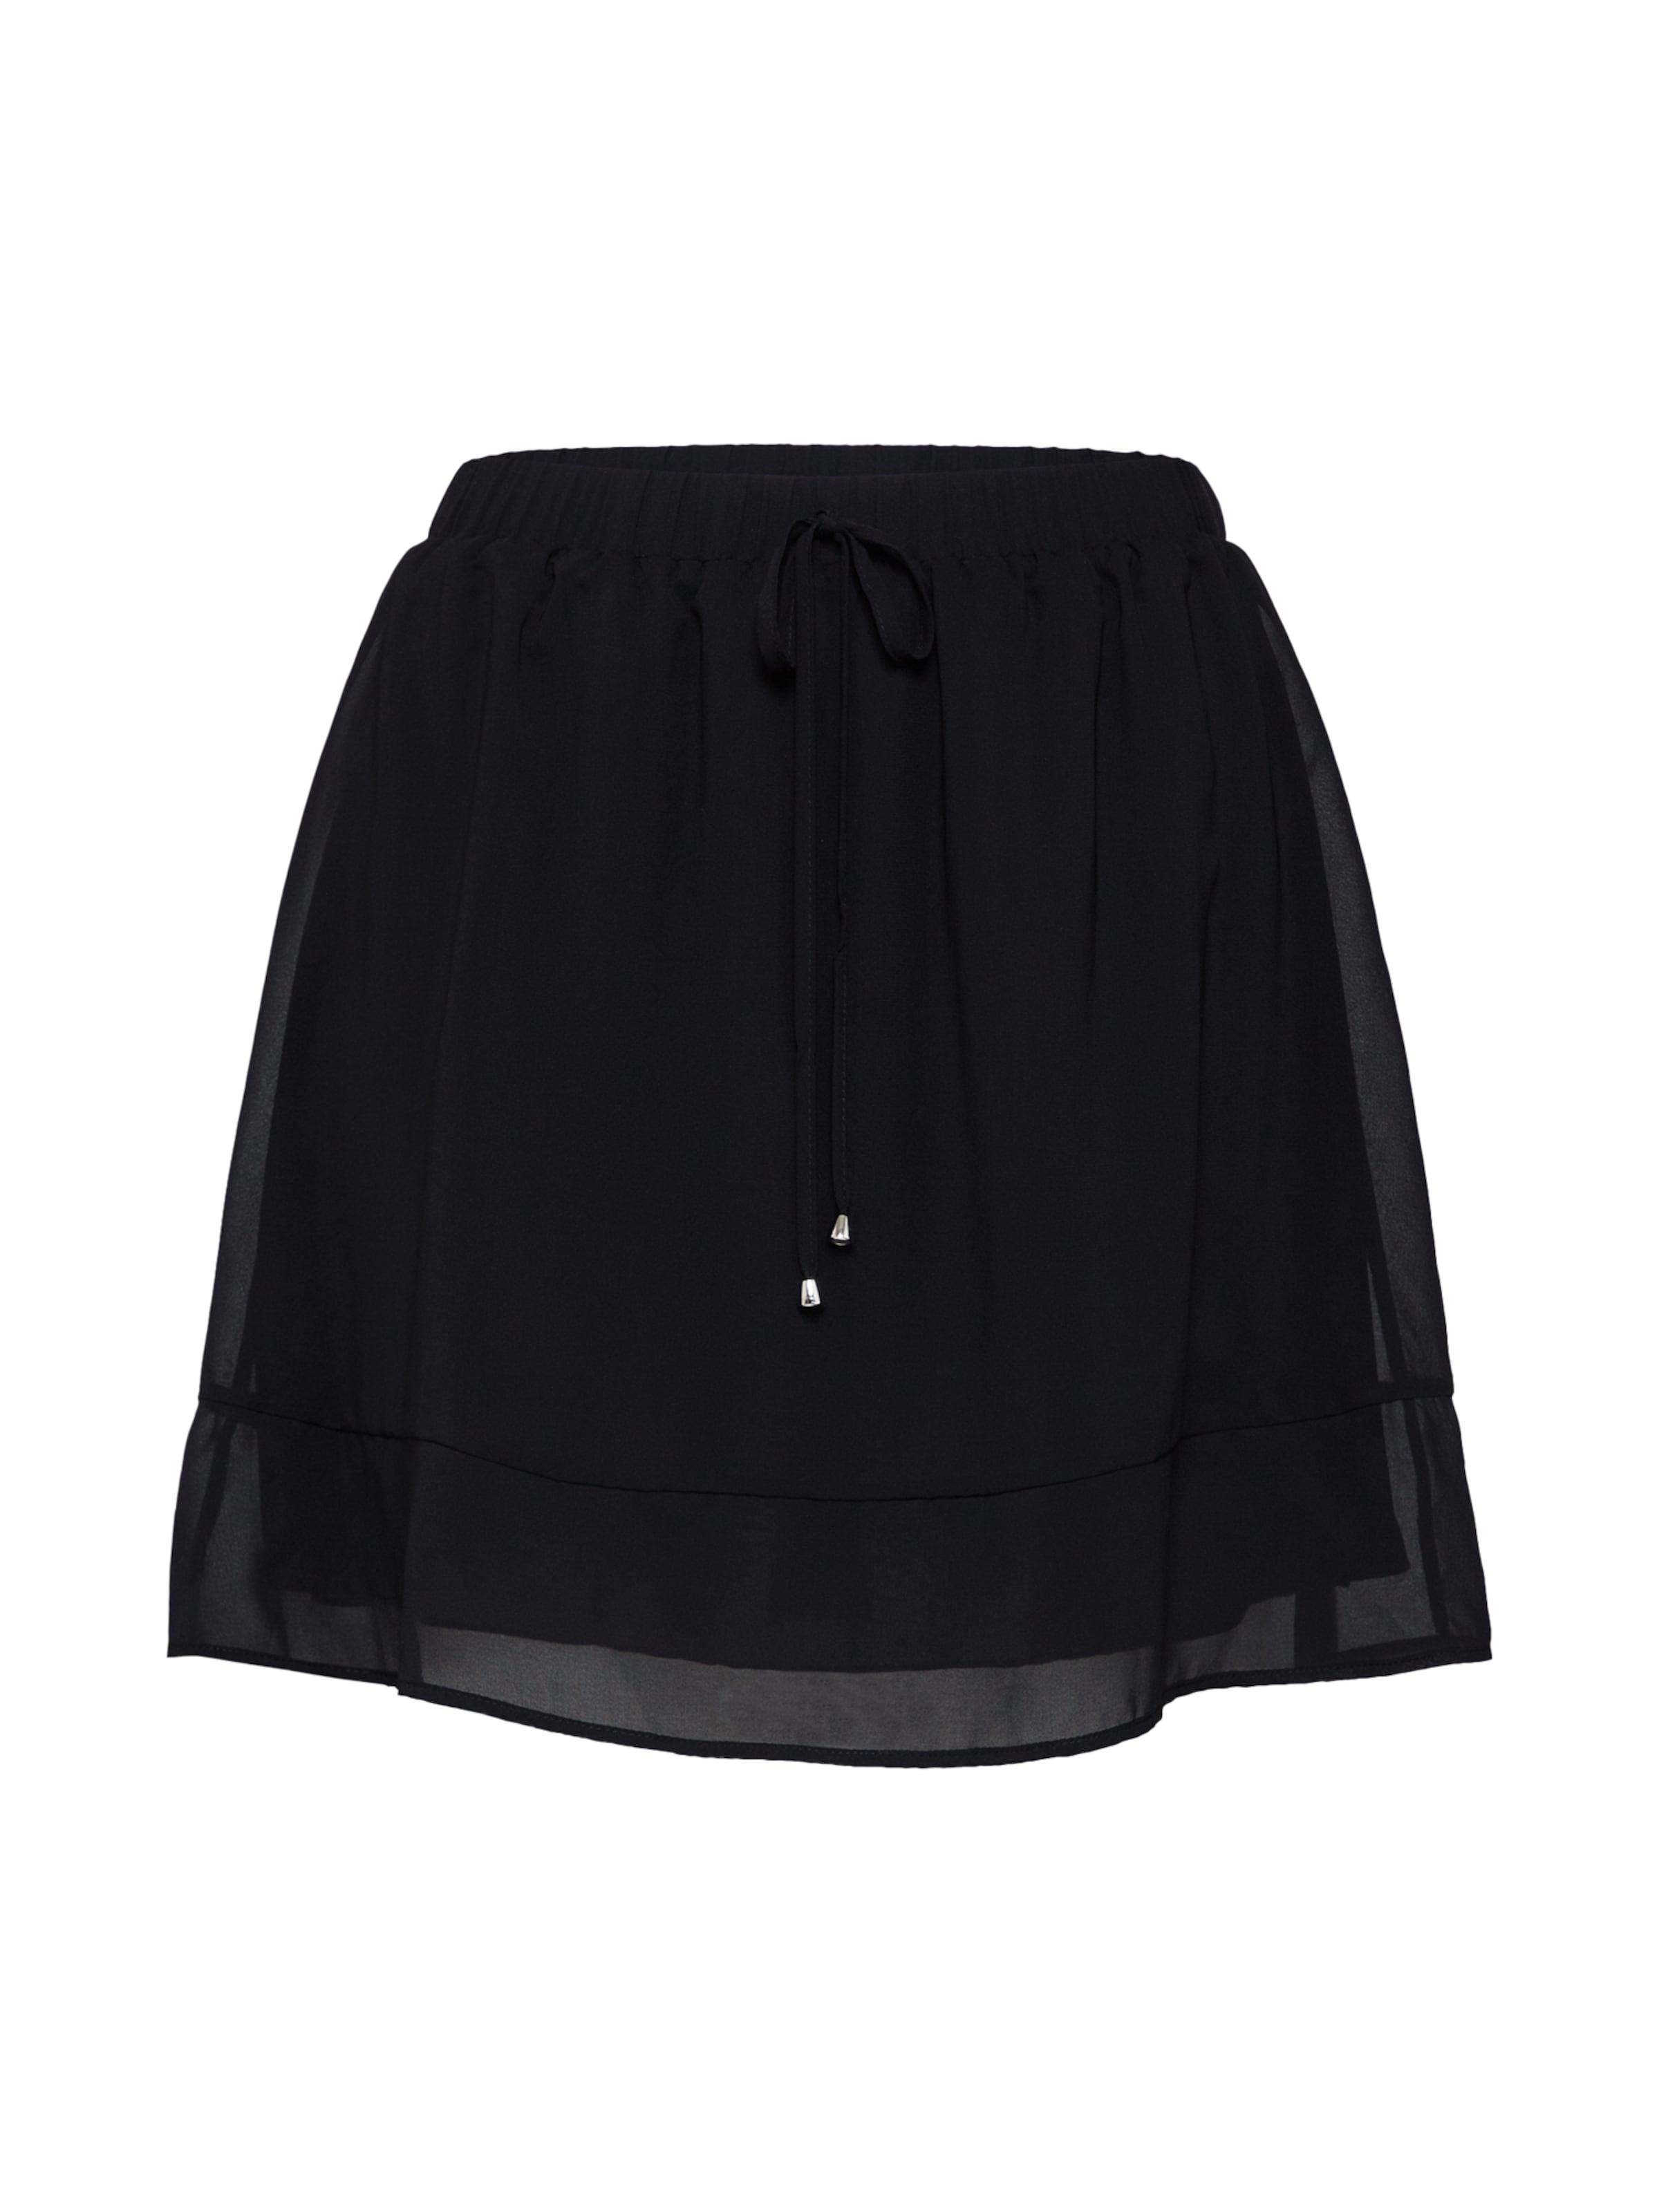 Jupe Noir Noir Jupe Jupe 'celia' En En Jupe En 'celia' Noir 'celia' pqGzUMSV